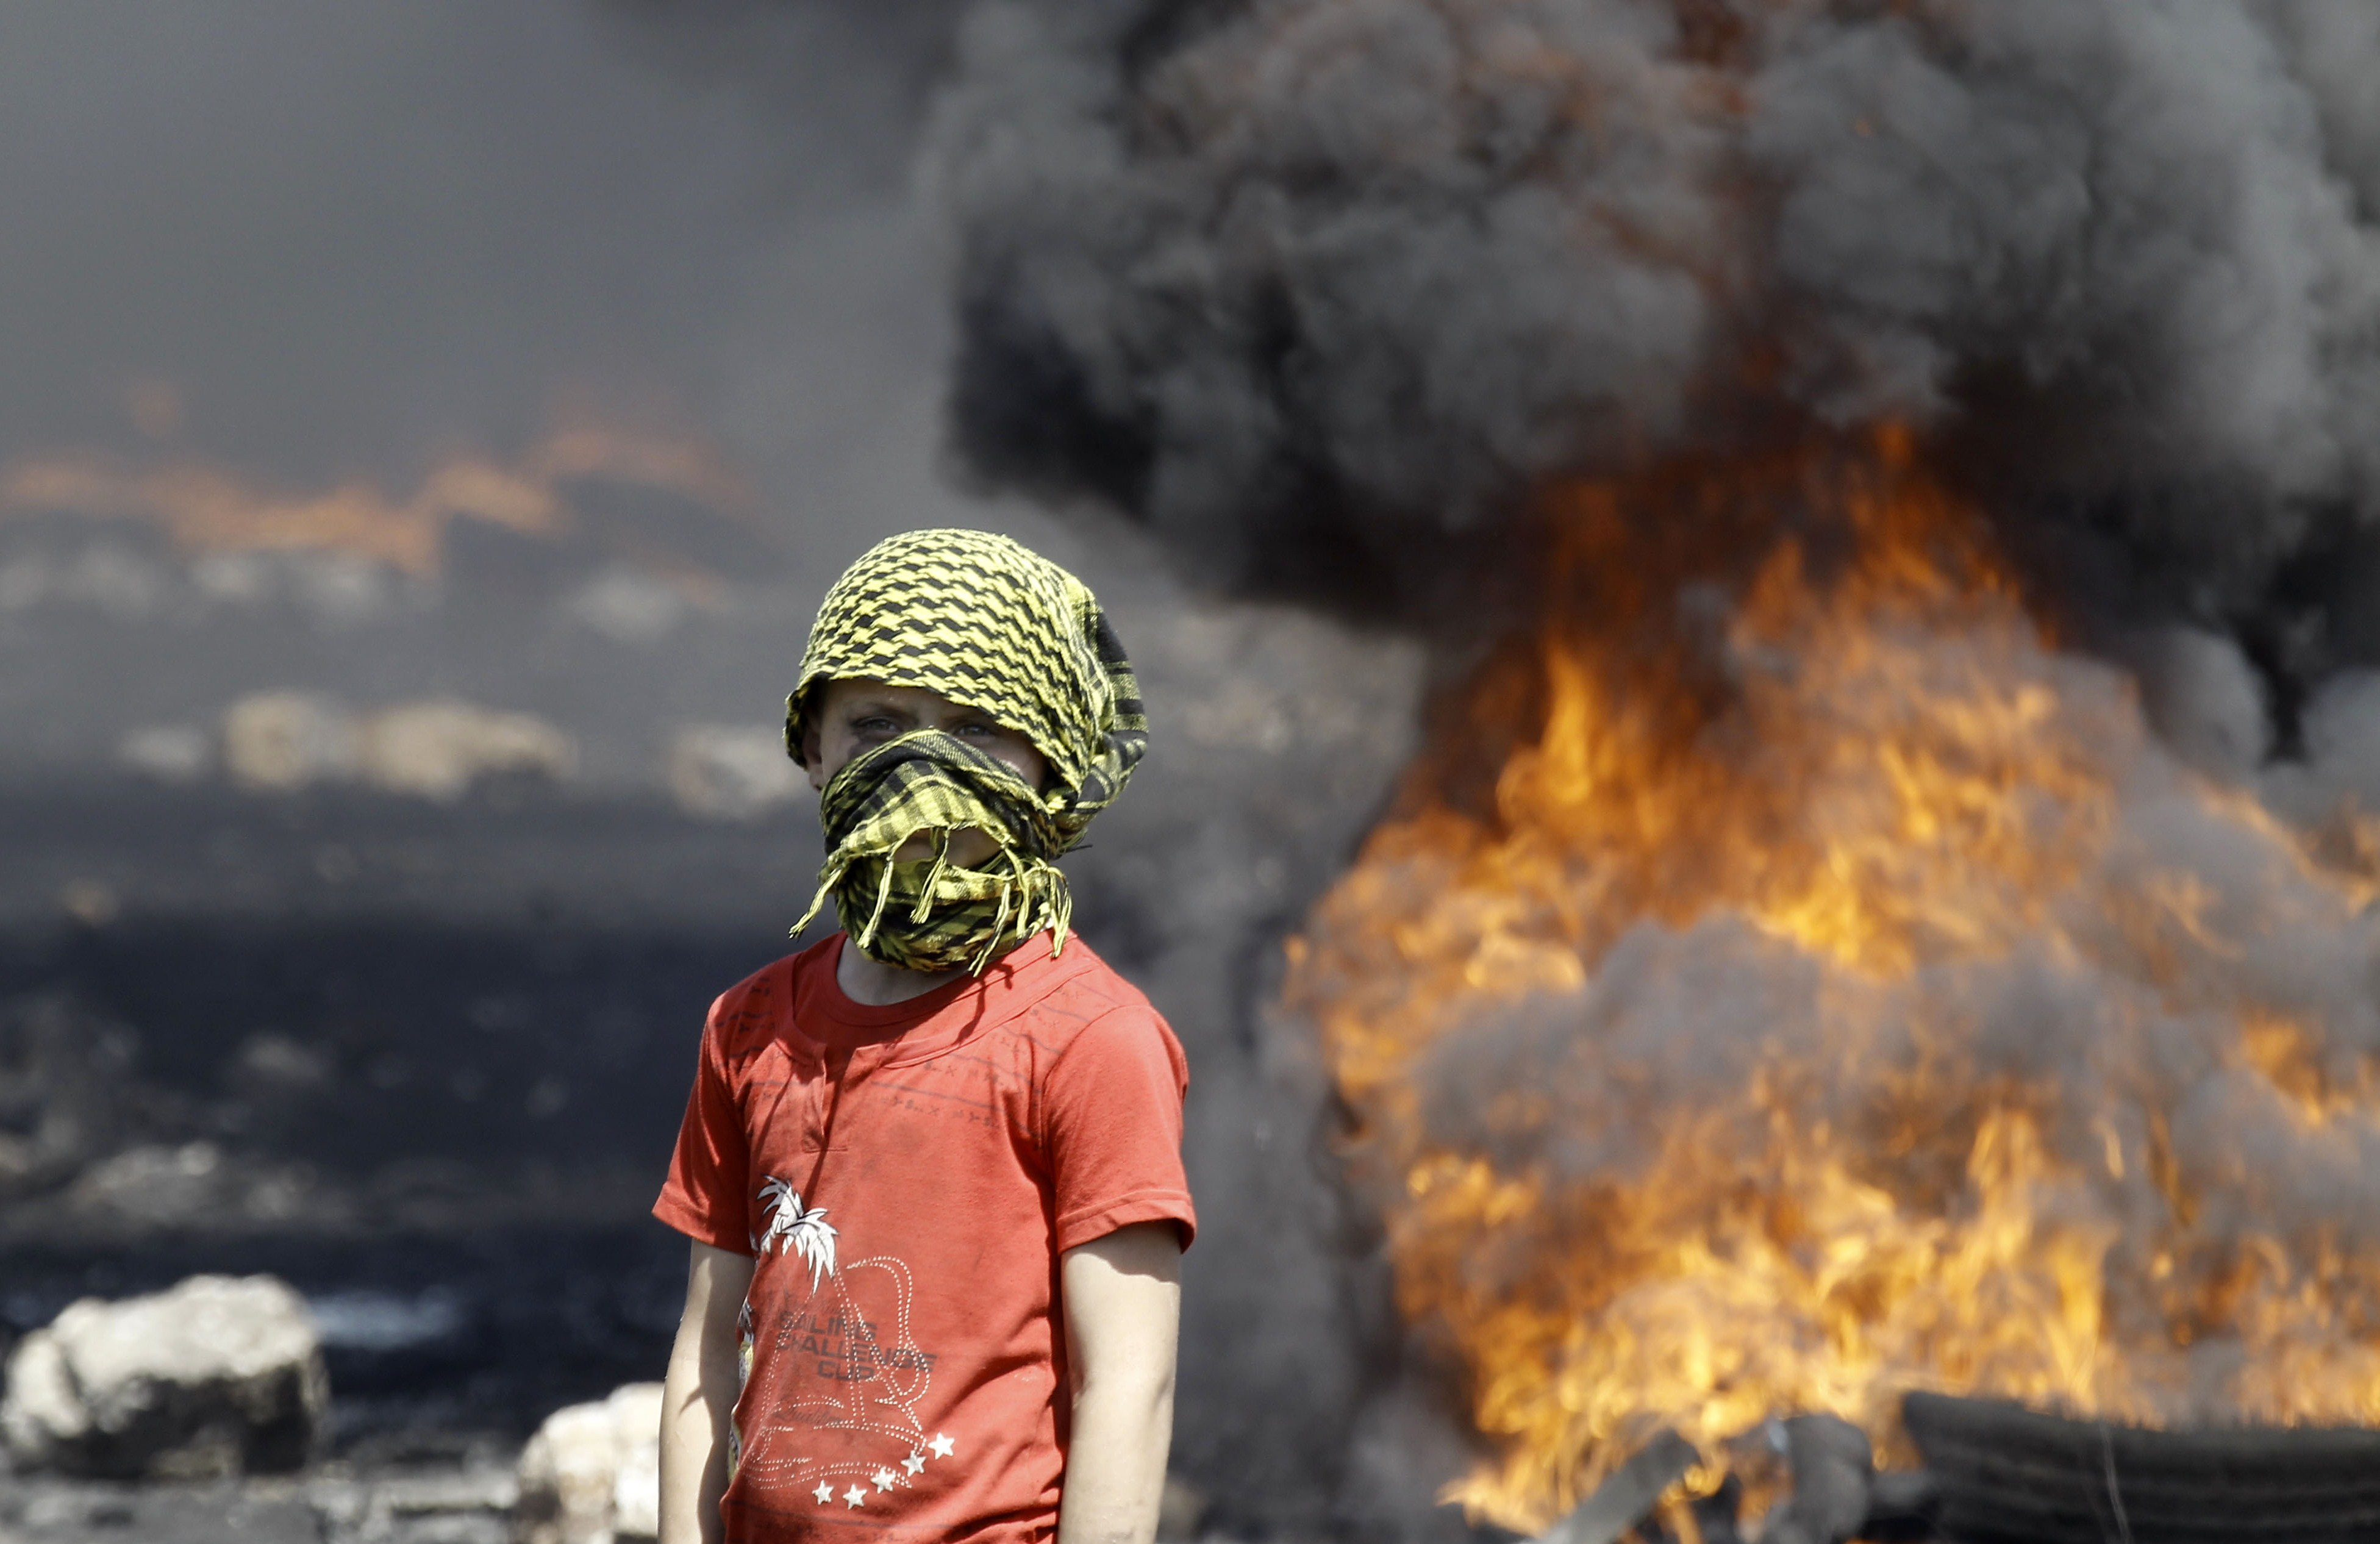 False Flag in Isreal? Wurde der Kriegsgrund gegen Palästina durch Israel selbst initiiert? (+Video)